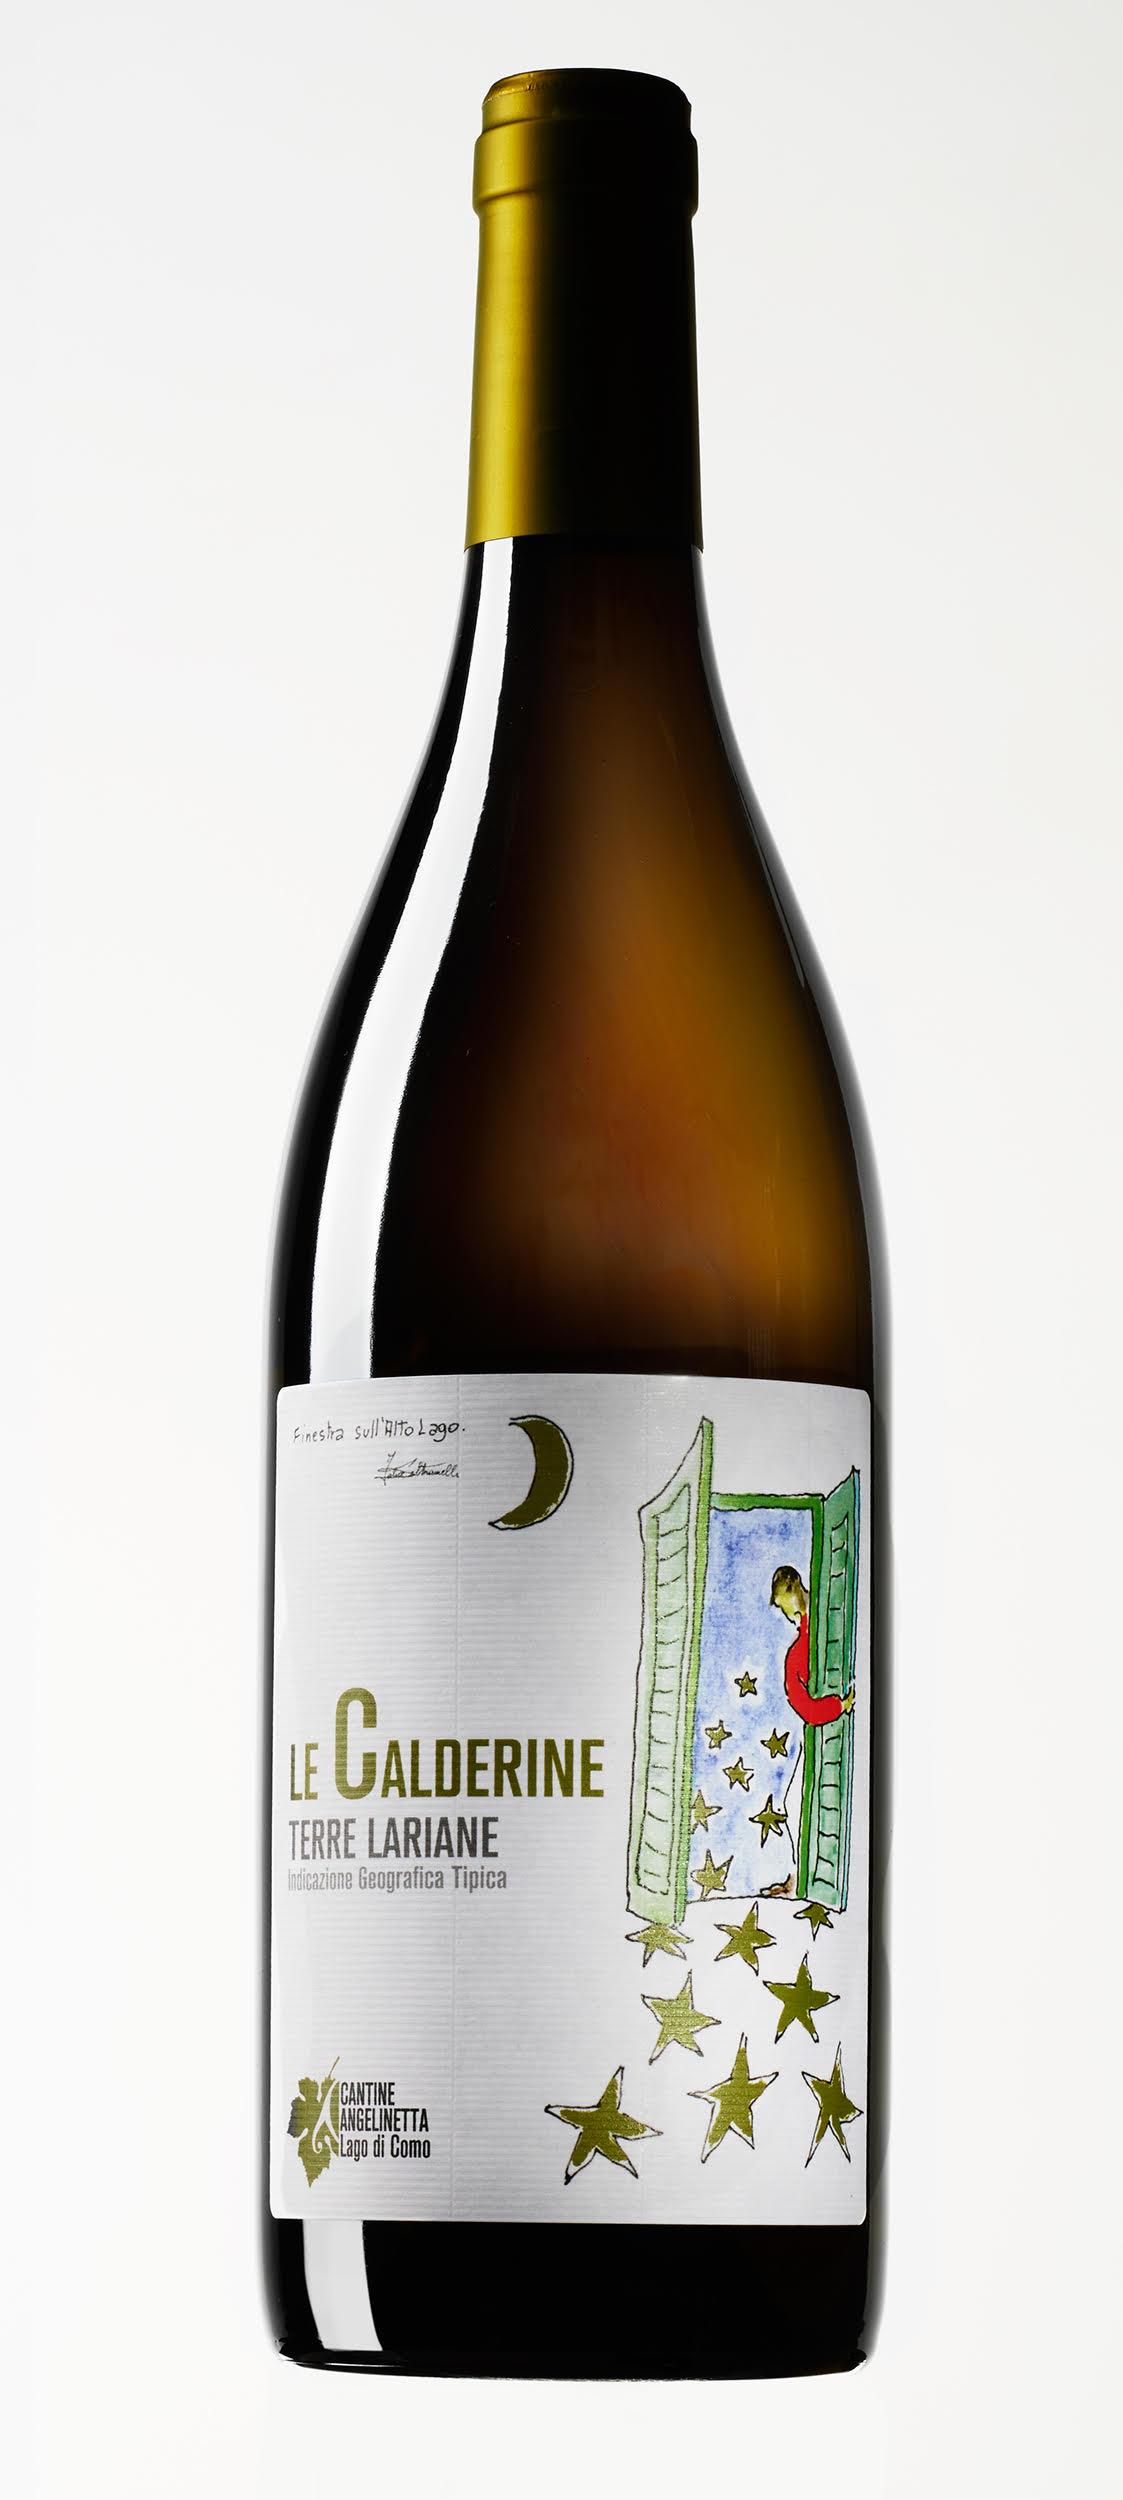 LAKE COMO LE CALDERINE IGT TERRE LARIANE